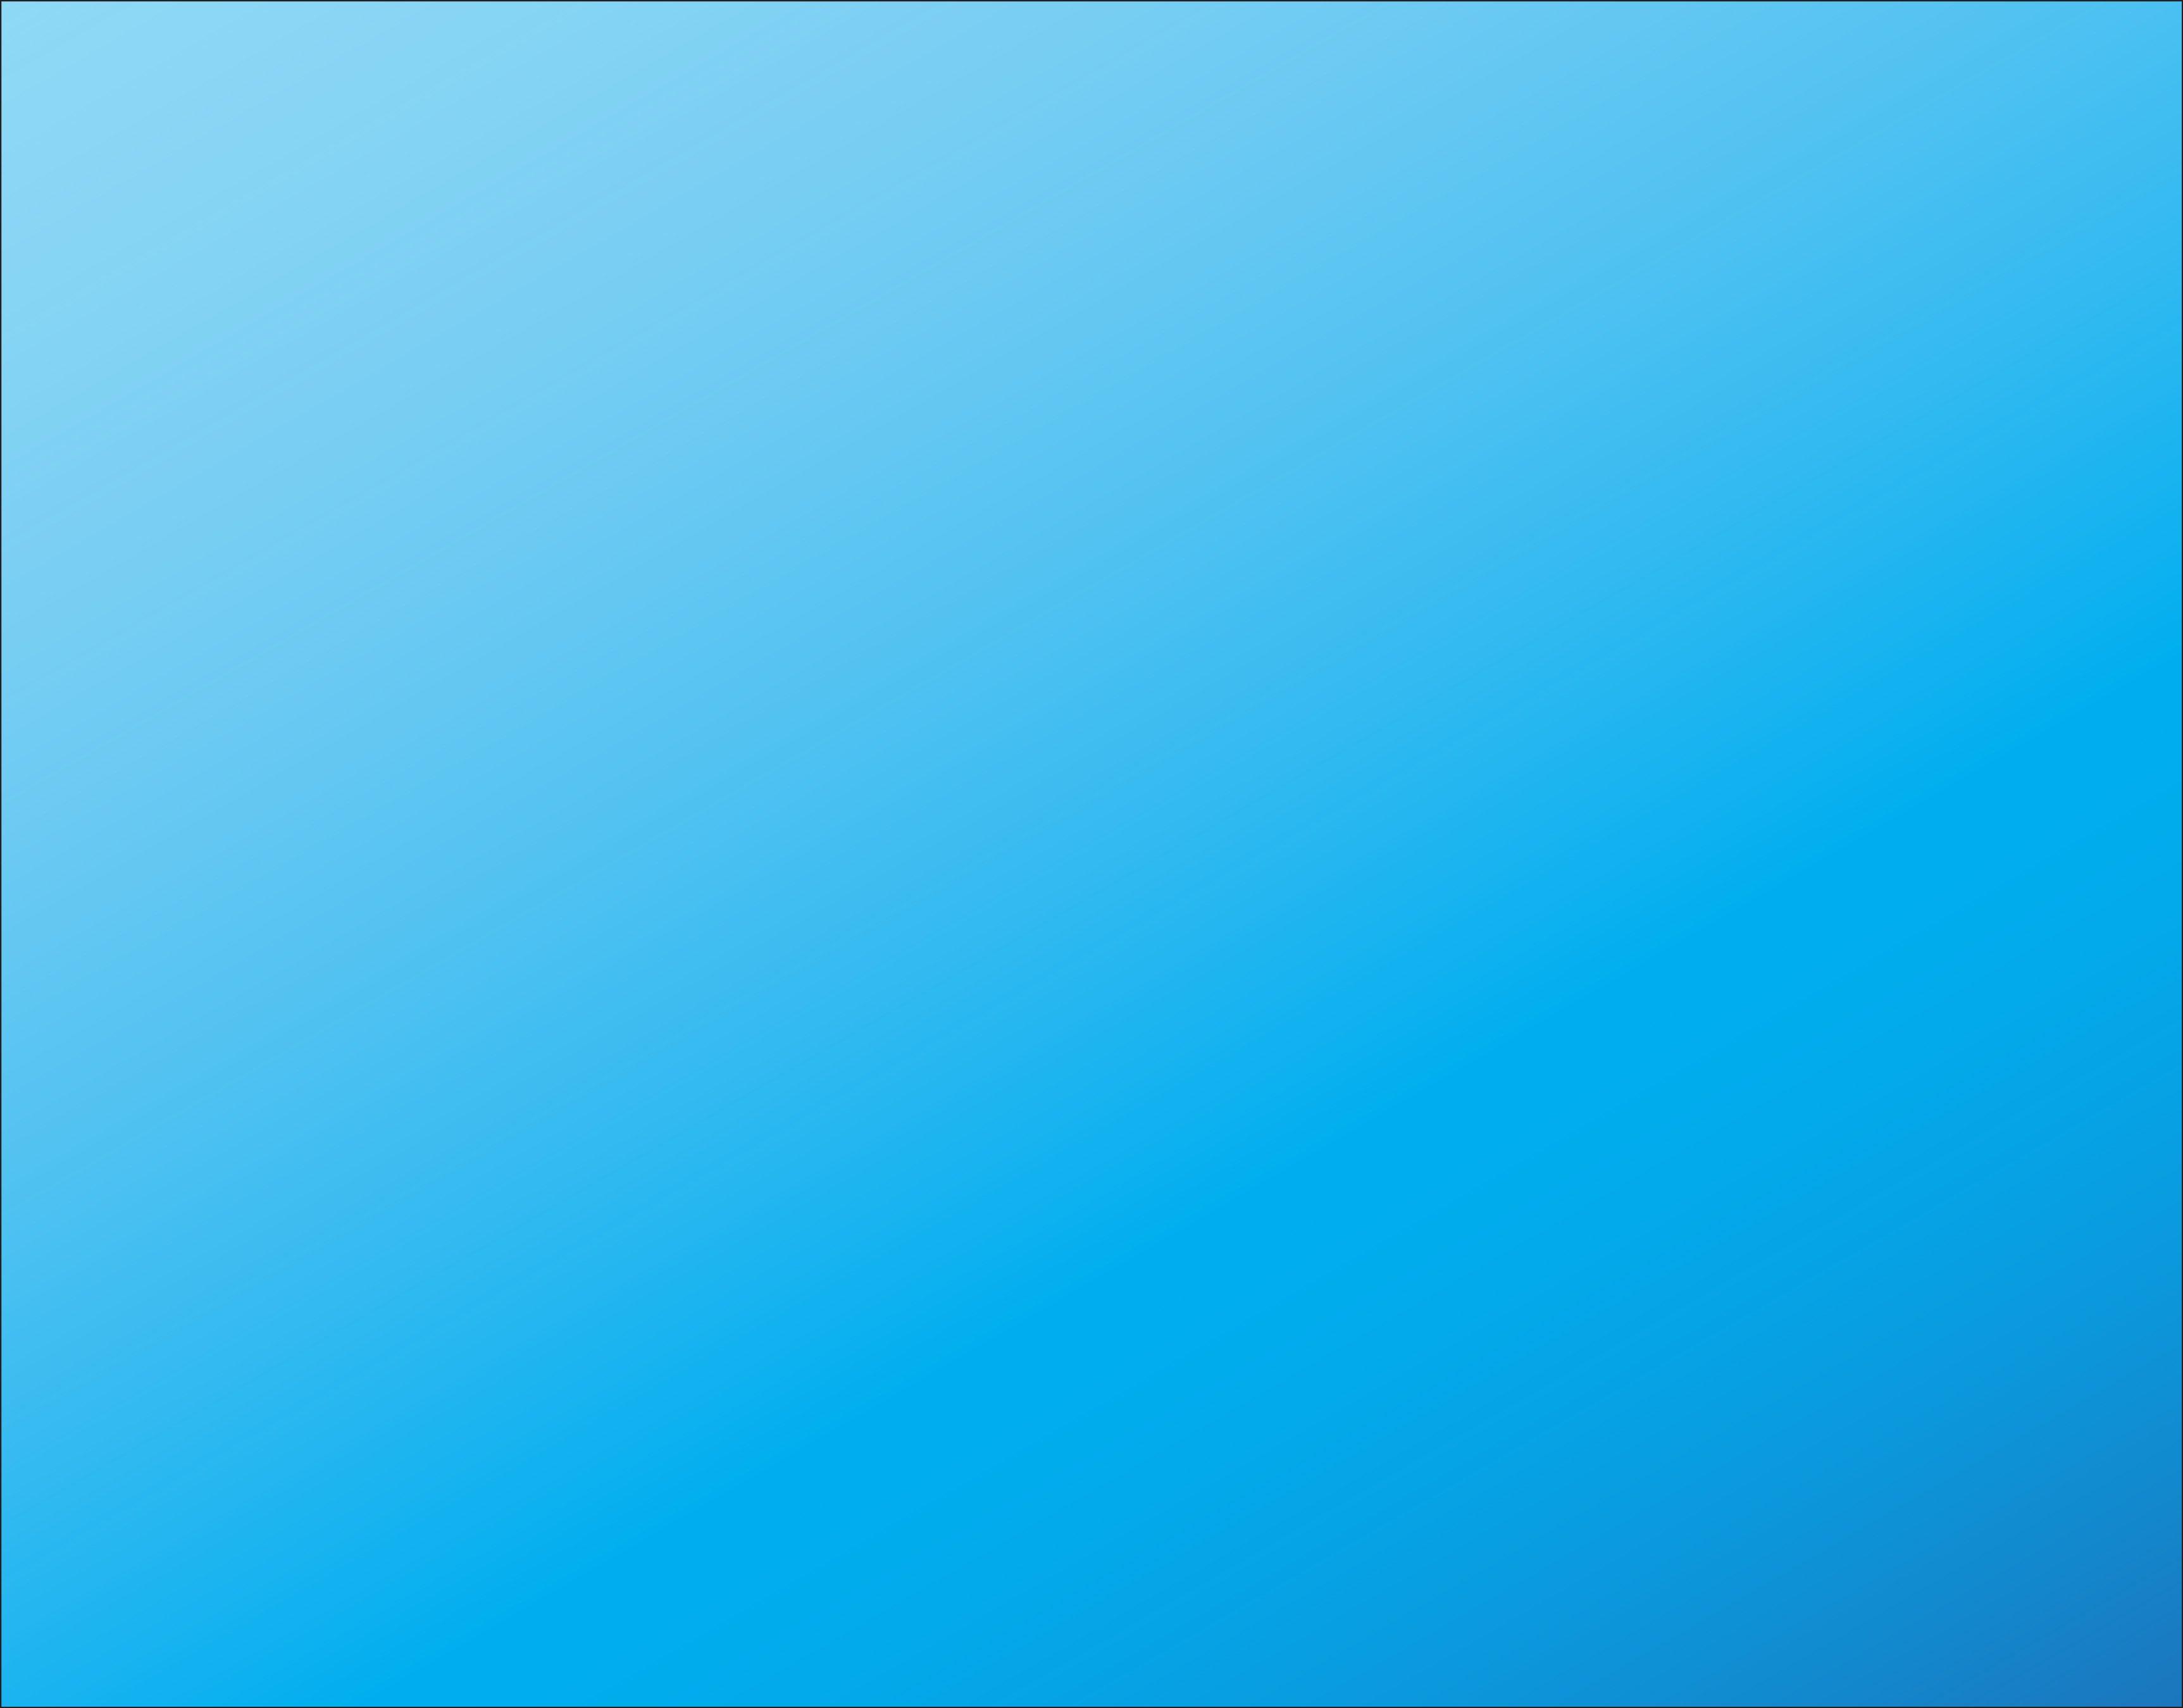 Light_Blue_Gradient_Background-01-01